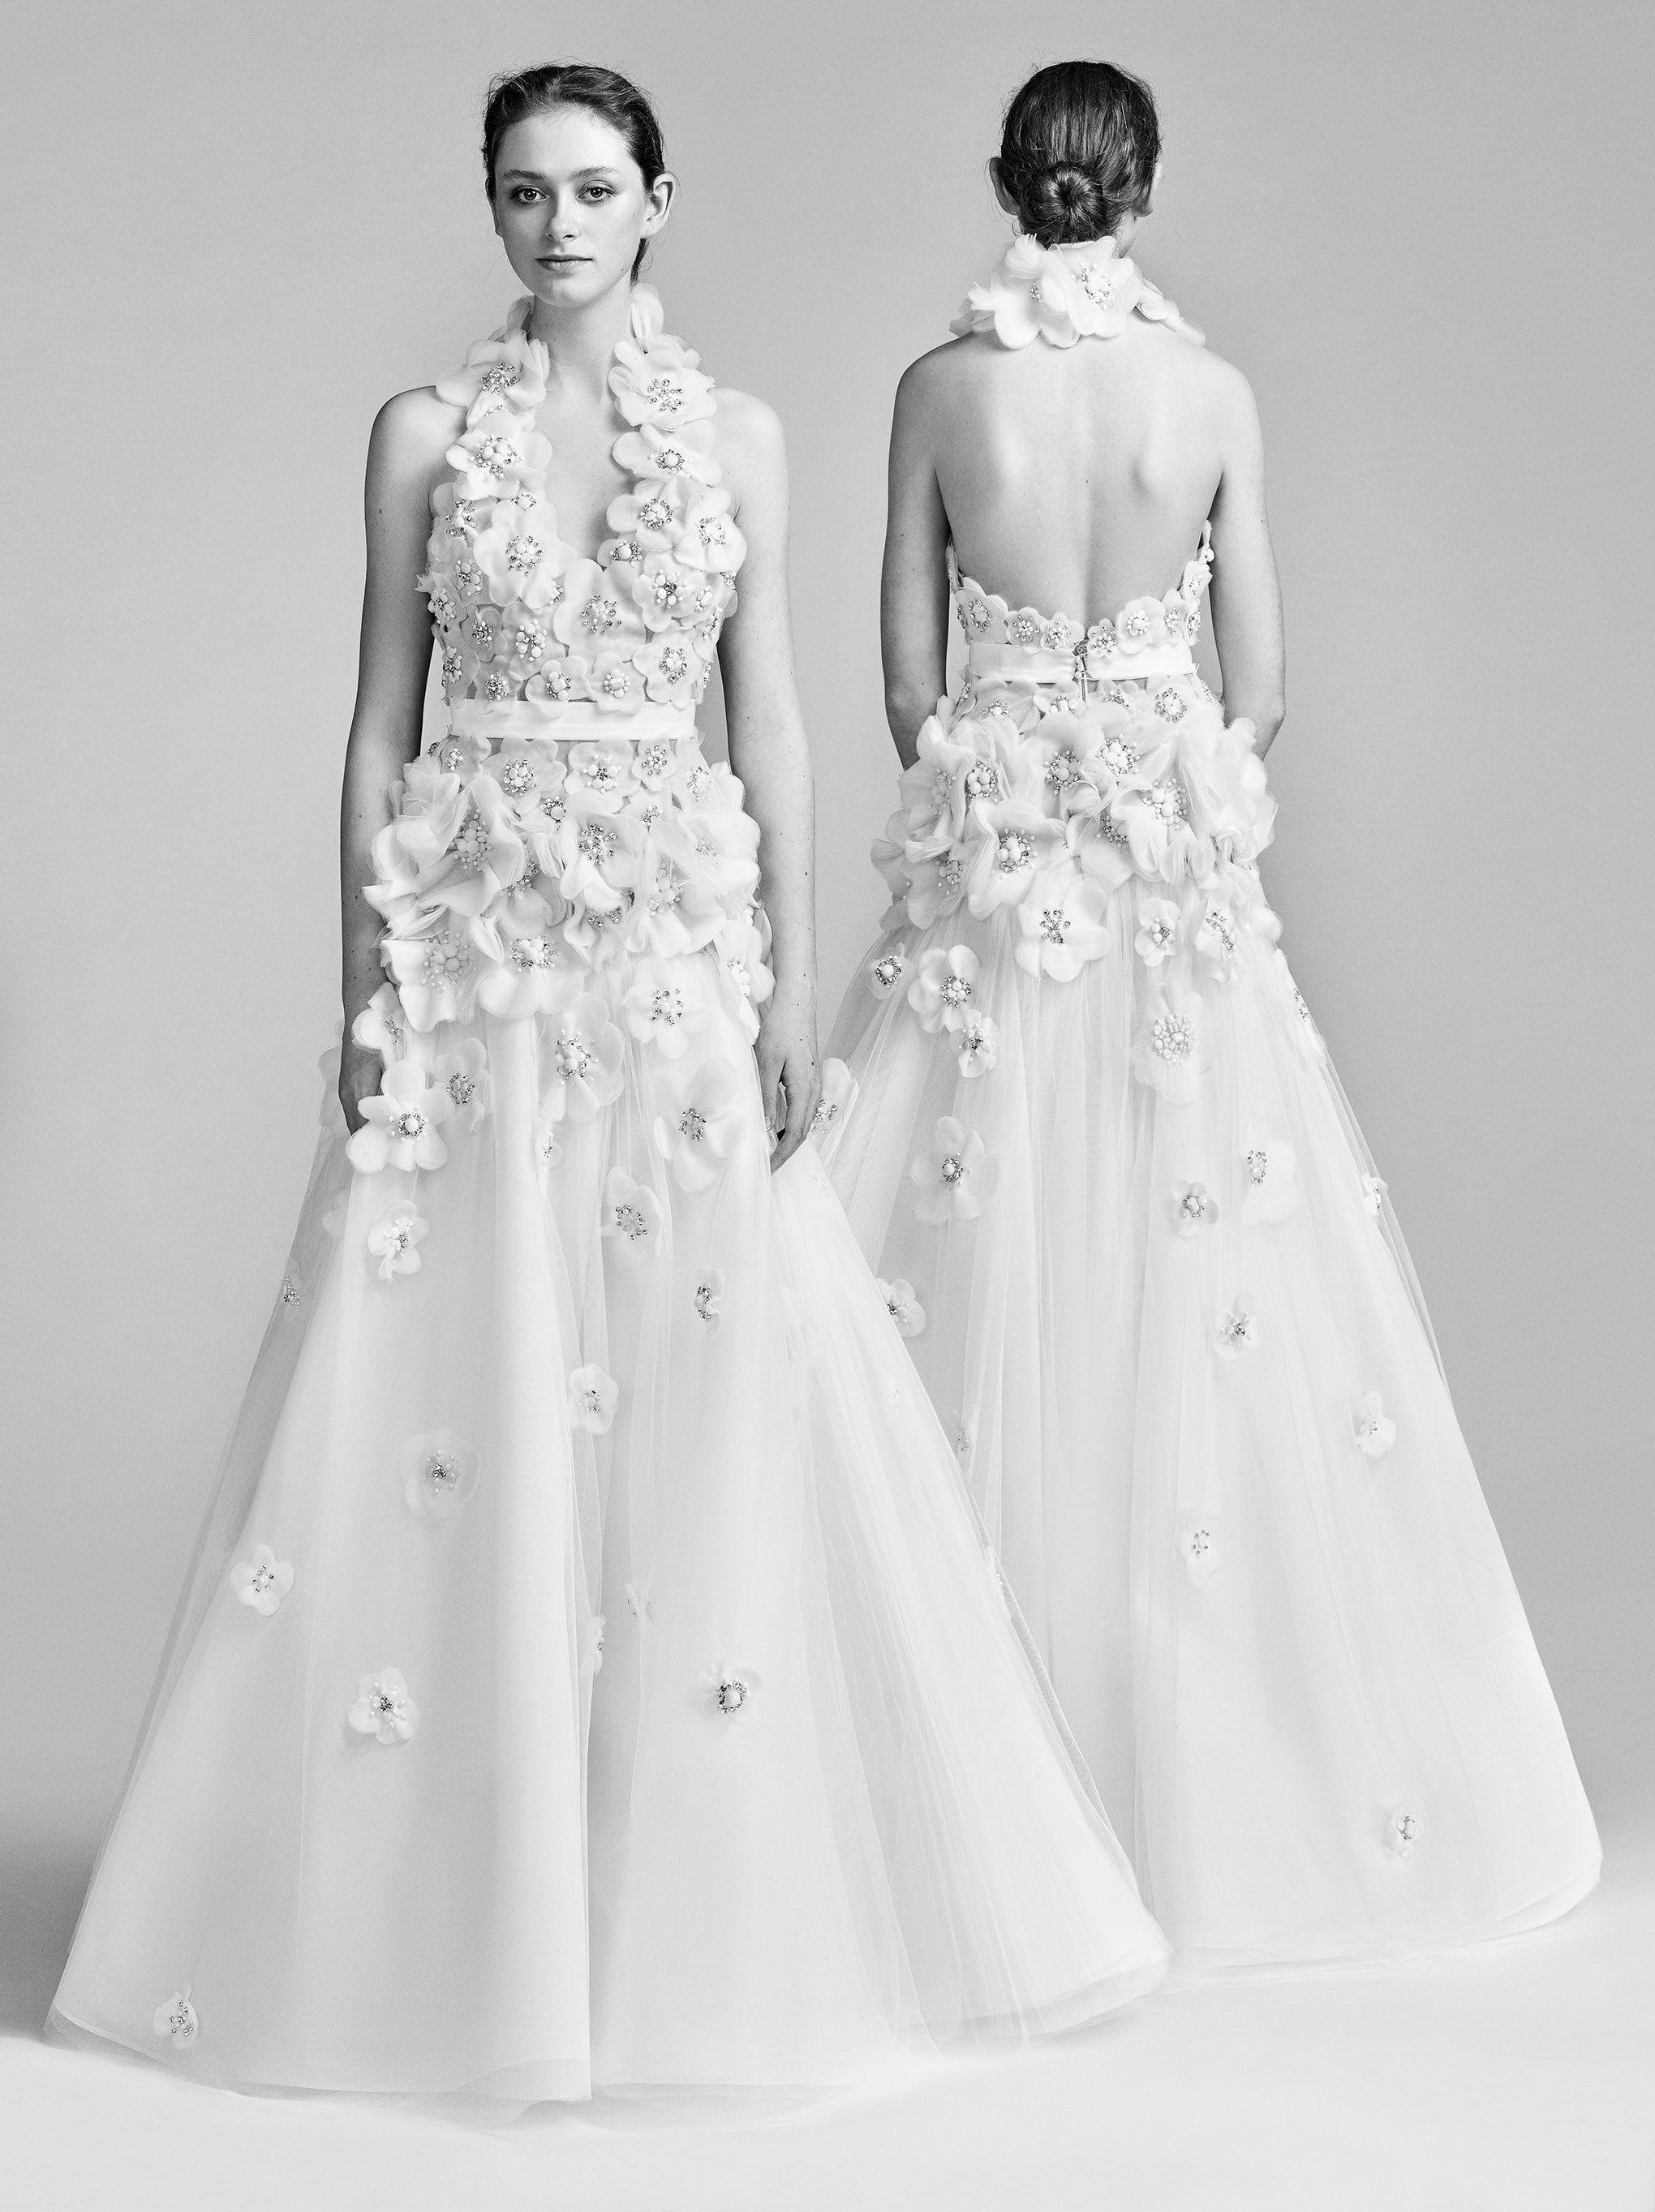 03481e003ce2 Viktor & Rolf Bridal Spring 2018 Fashion Show   Bridal   Wedding ...